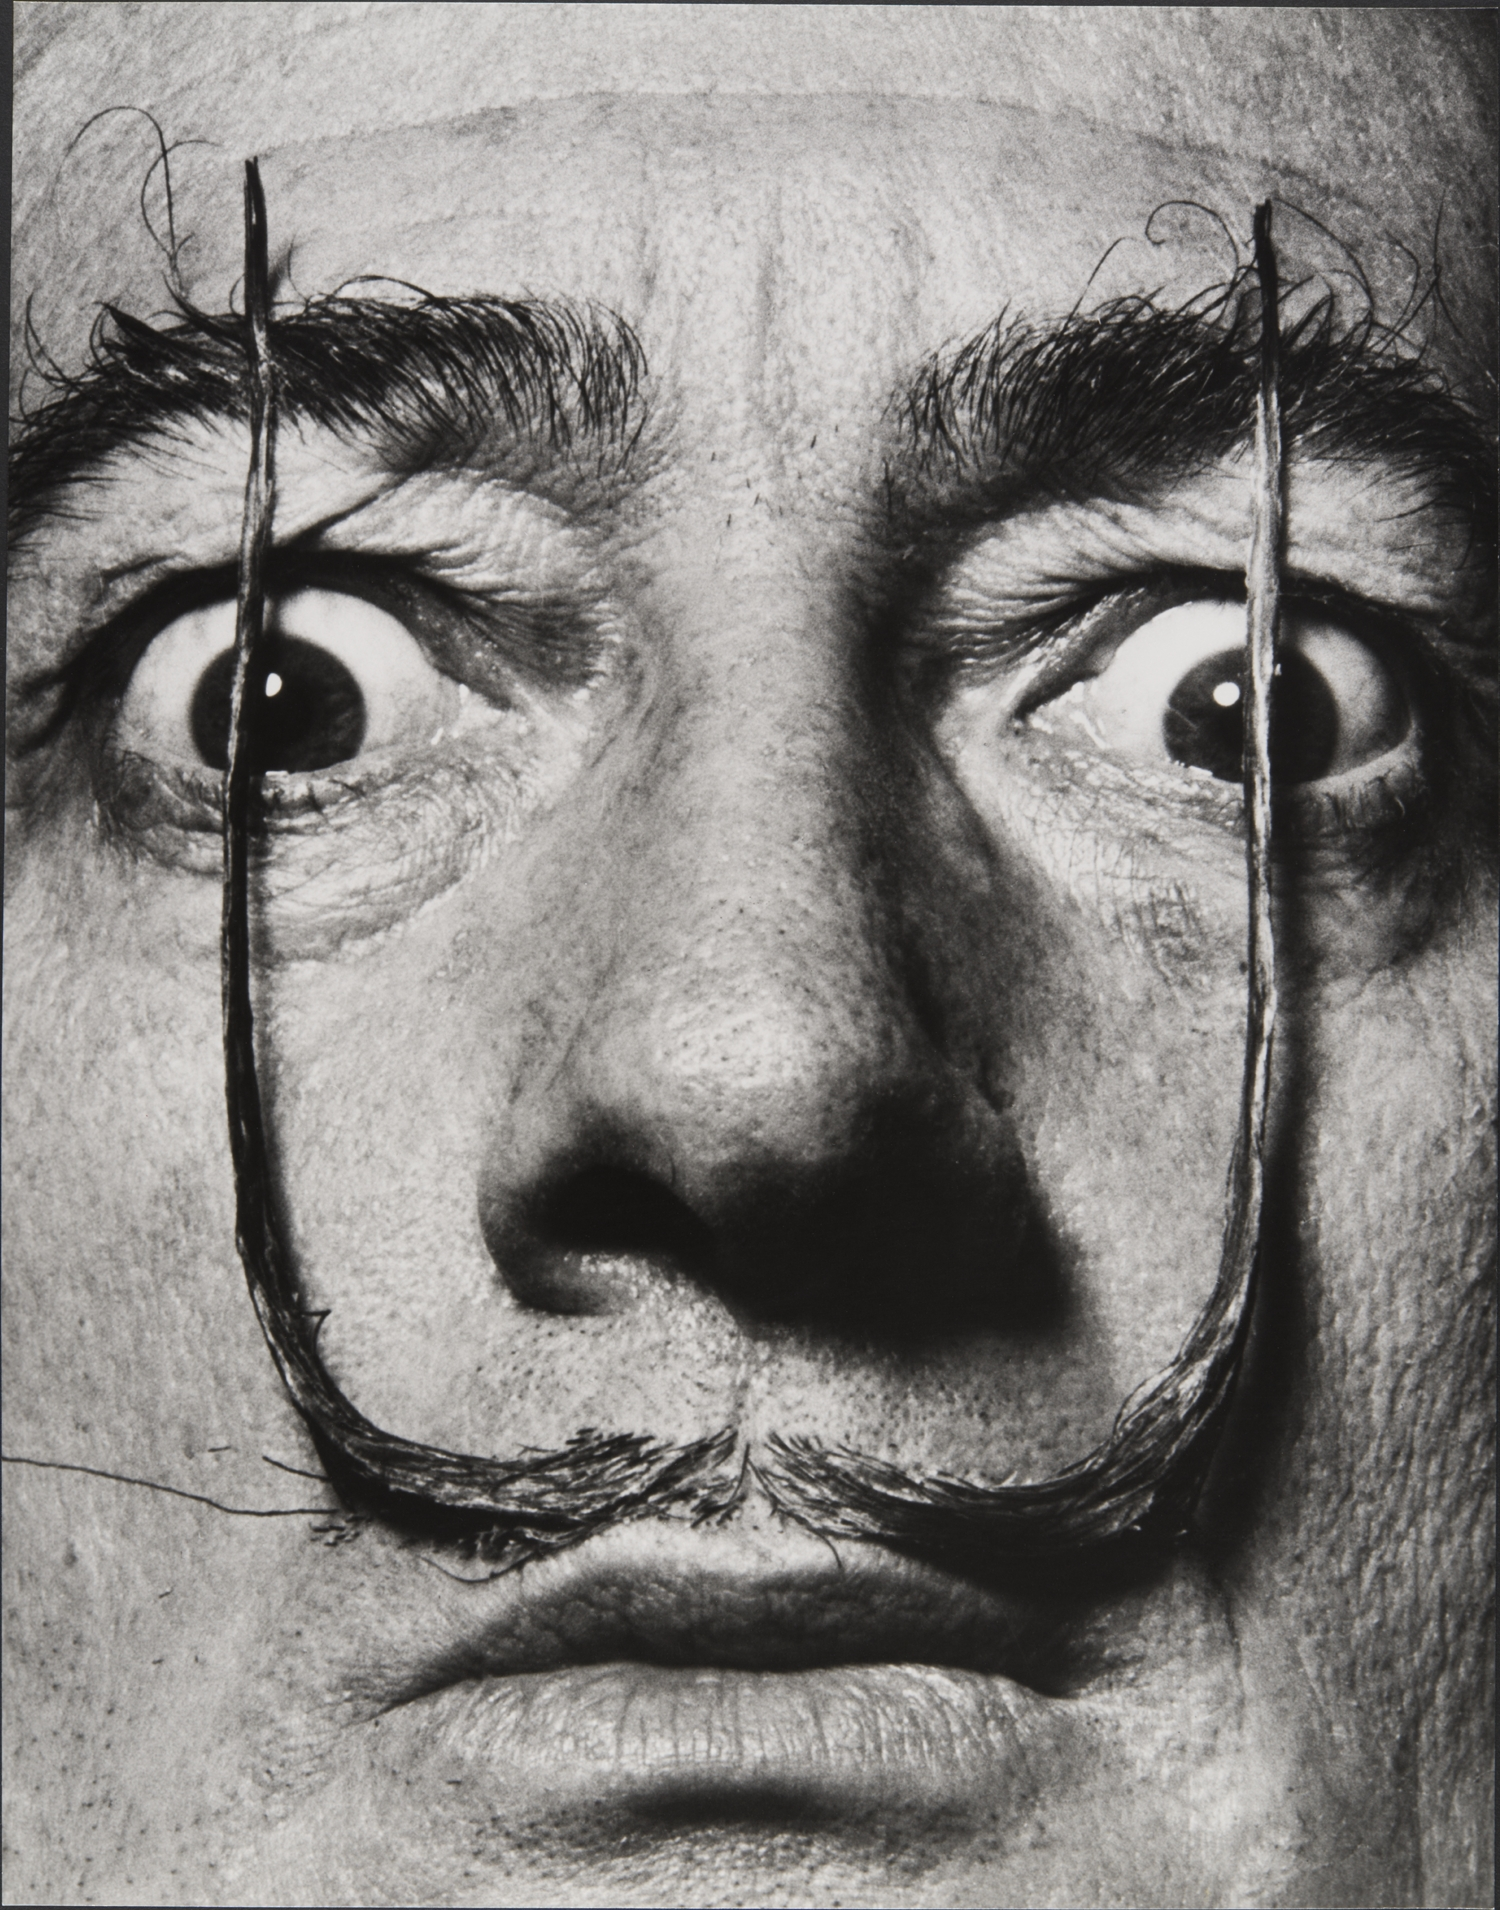 philippe-halsman-como-dos-centinelas-erguidos-mi-bigote-custodia-la-entrada-a-mi-verdadero-yo-dali-s-mustache-1954-ph